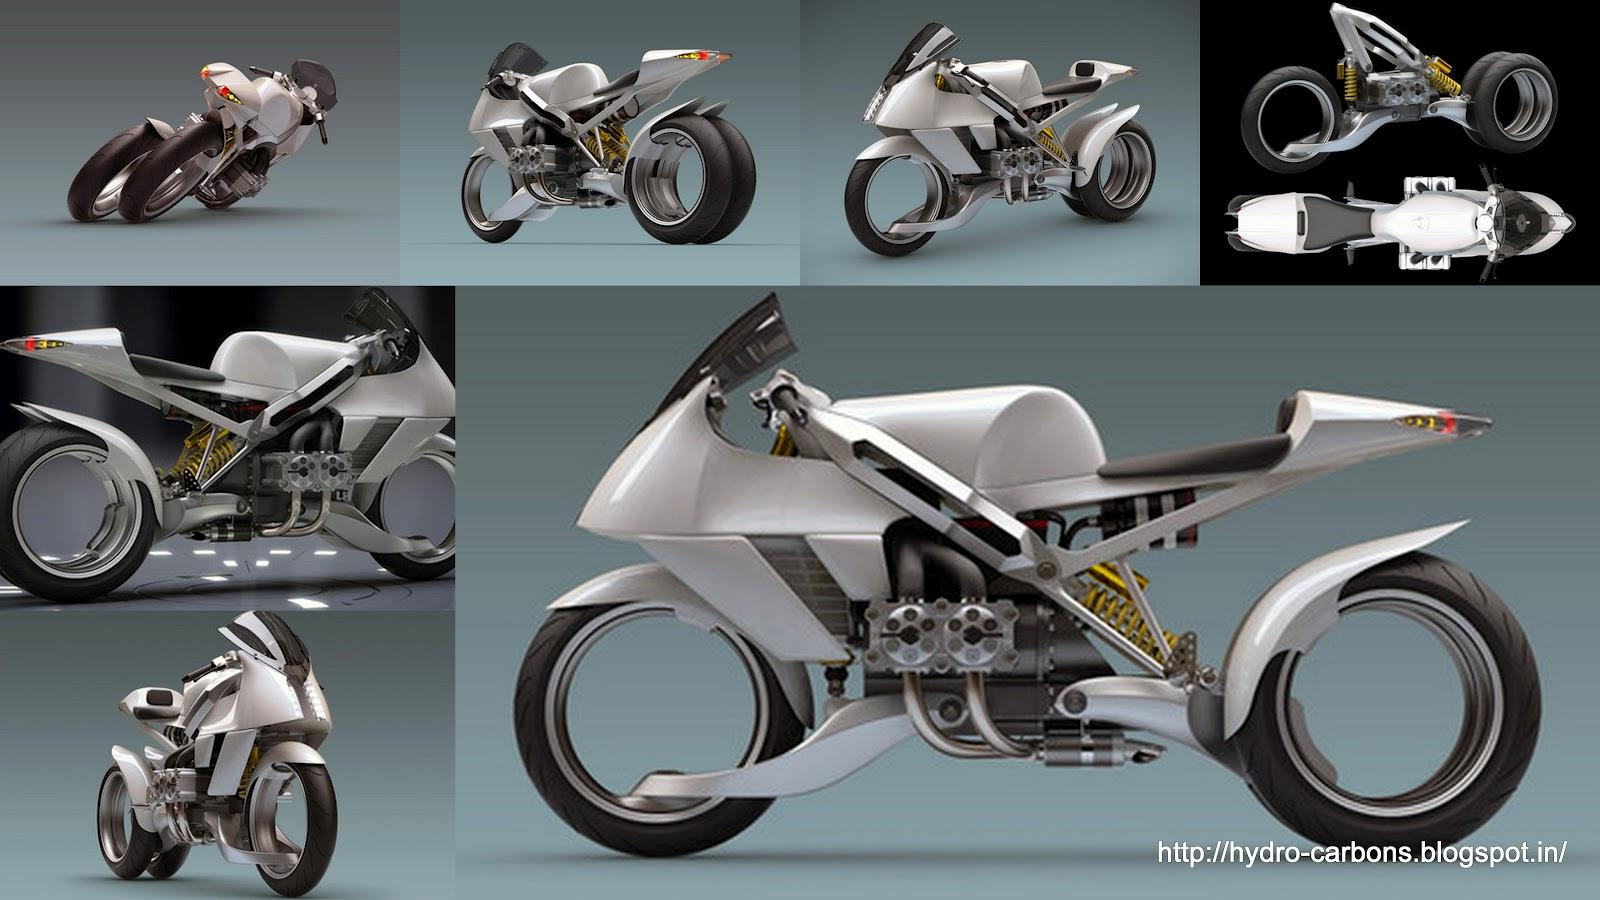 Motom Motorcycle Grease N Gasoline | Tattoo Design Bild - photo#49